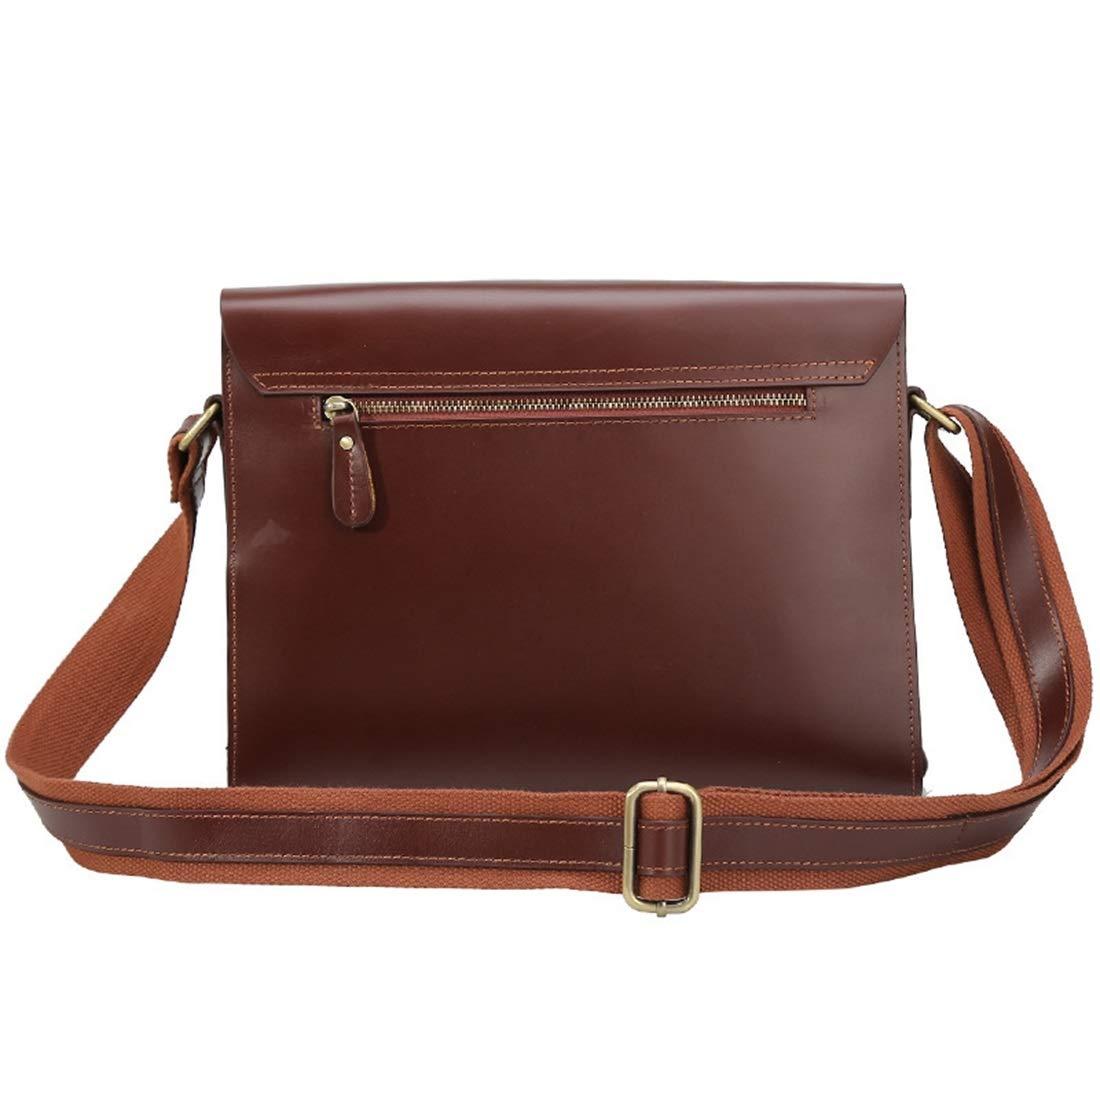 Color : Brown XIAMEND Office Flap Handbag Retro Leather Business Briefcase 9.7 Tablet Messenger Crossbody Satchel Bag